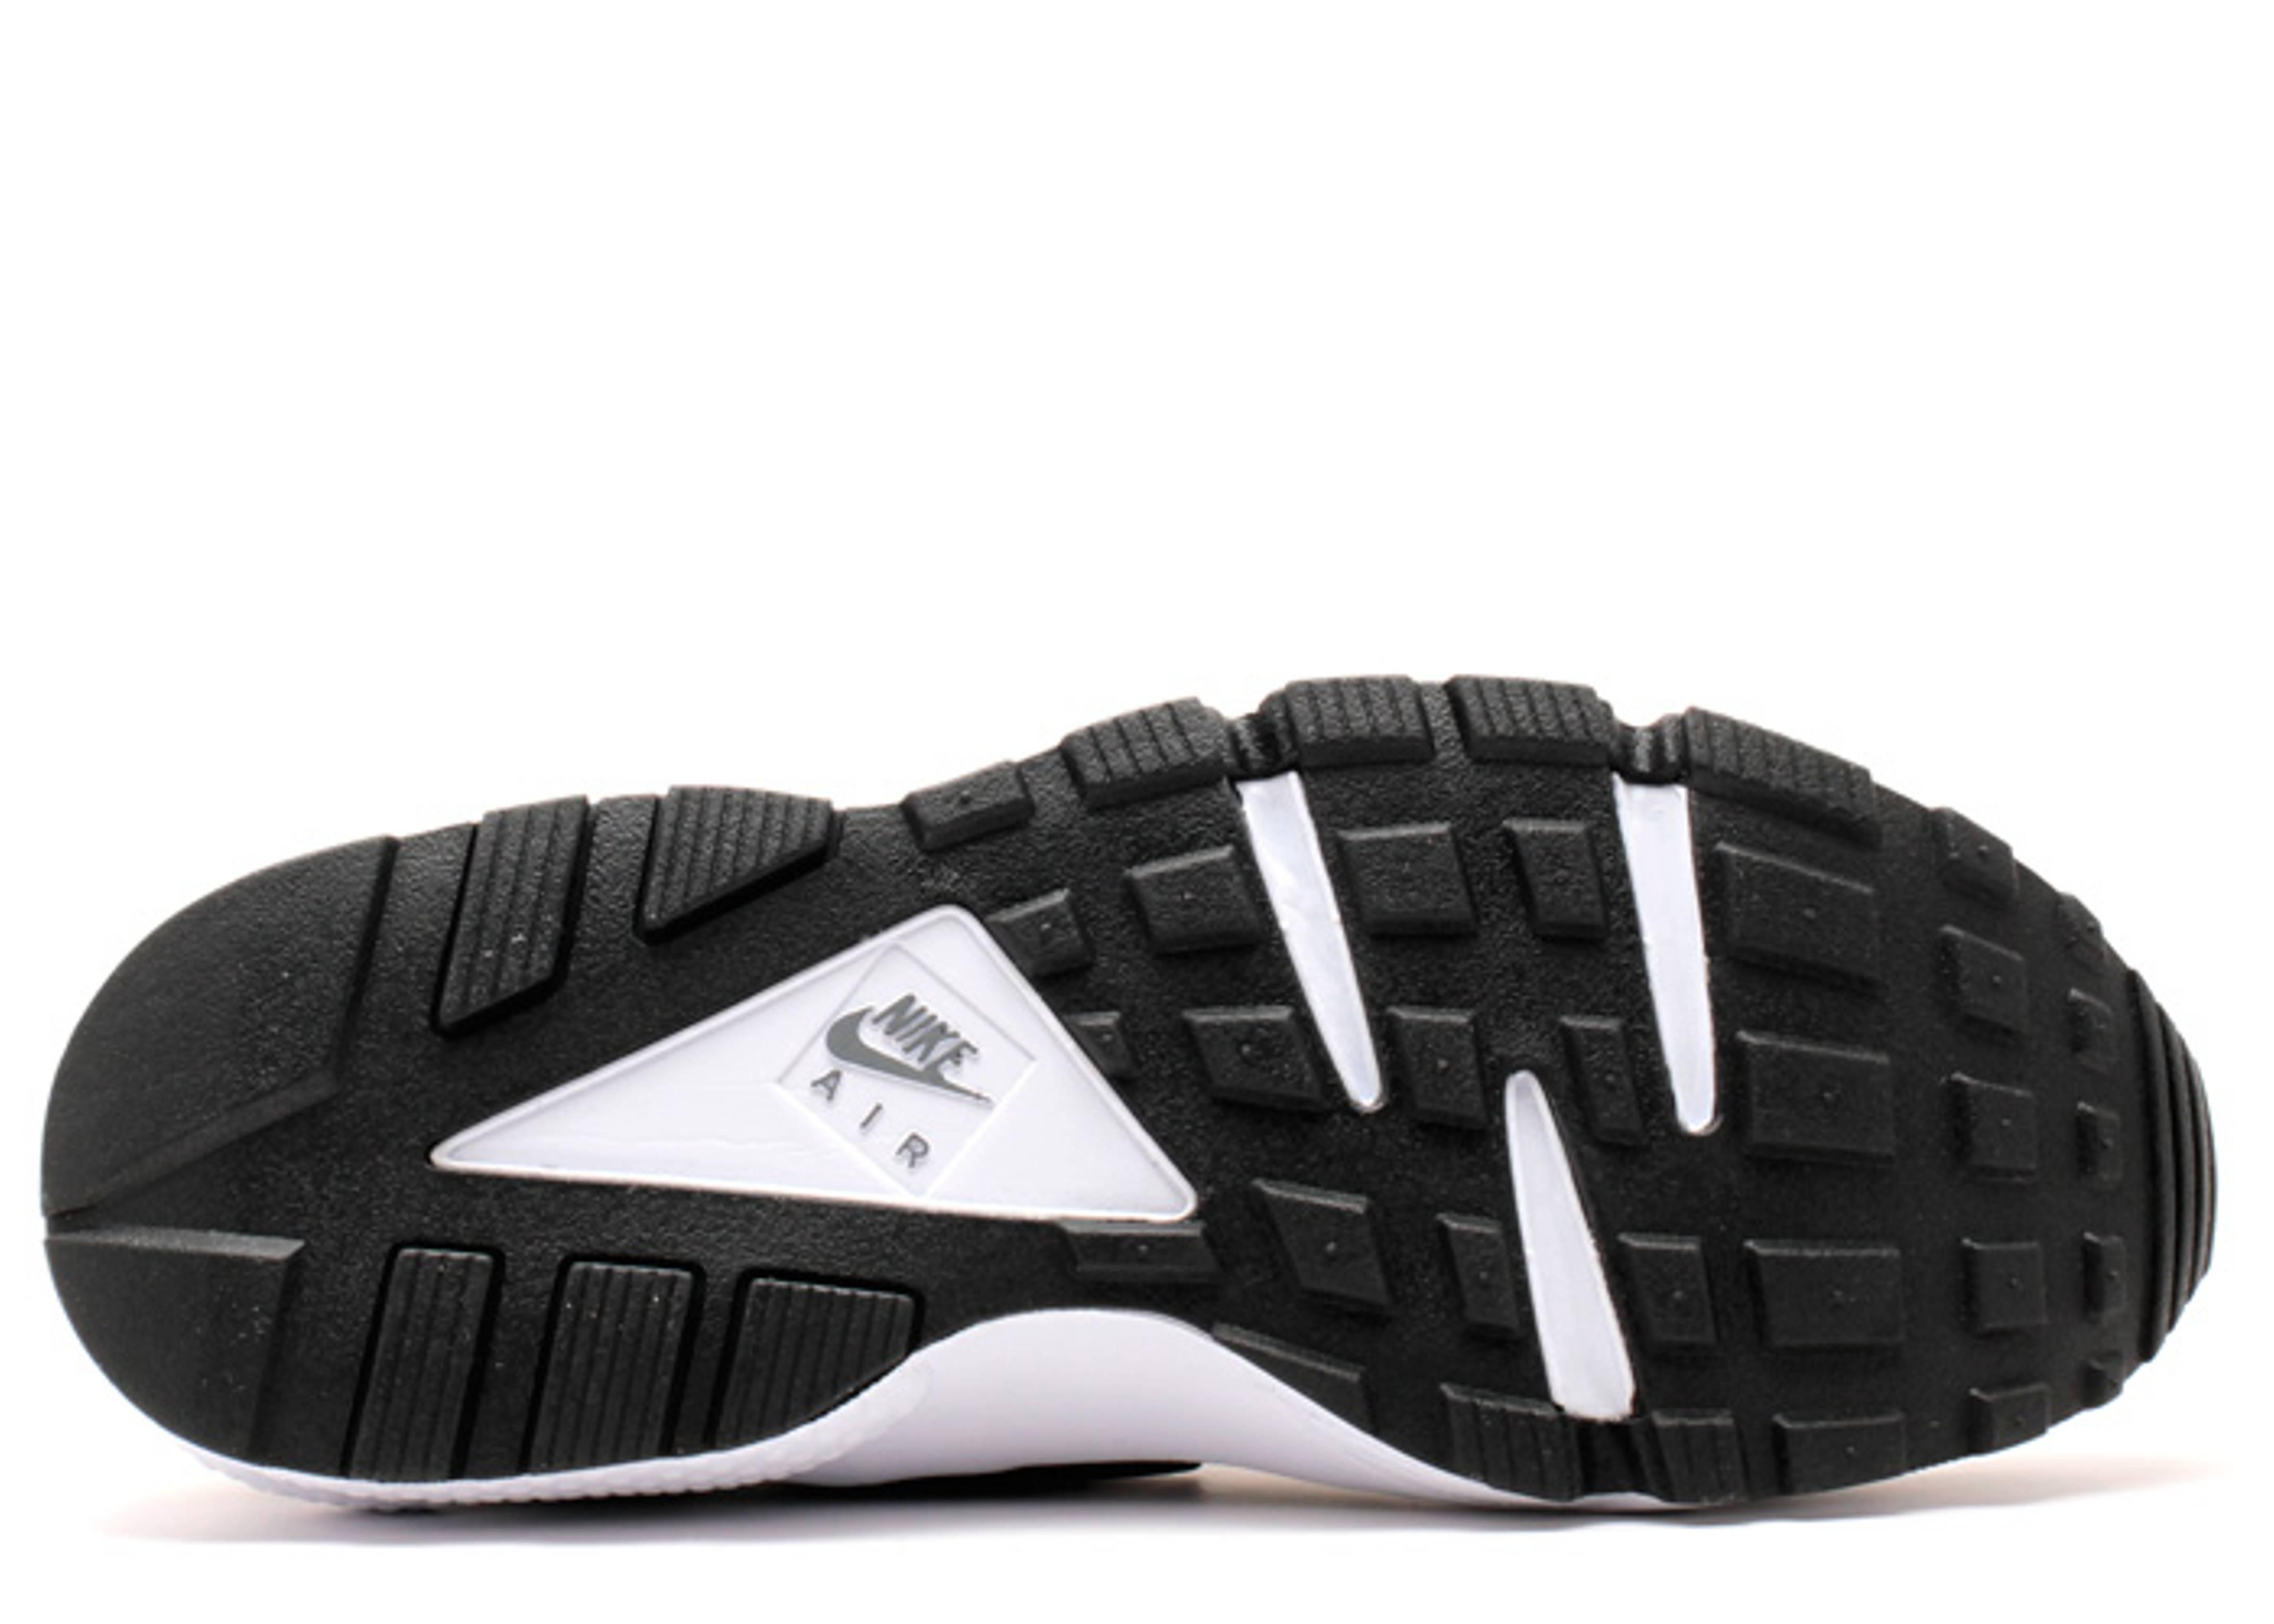 Air Huarache 'Light Ash Grey' - Nike - 318429 005 - light ash grey ...